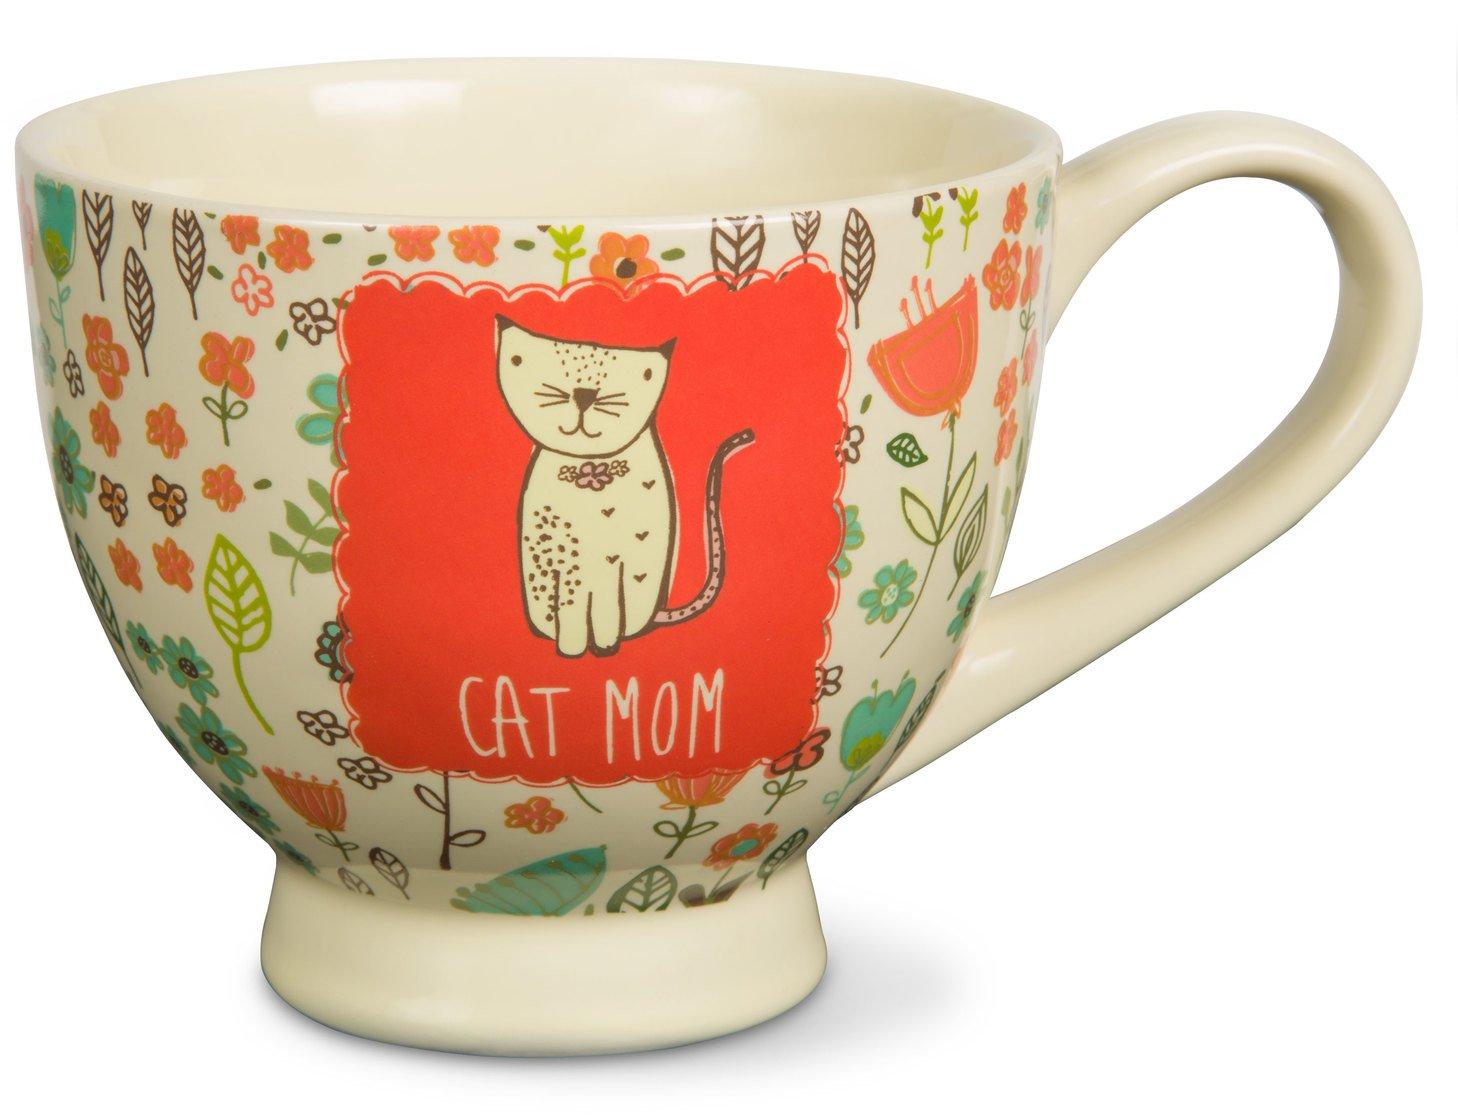 Pavilion Gift Company 54007'' A Mother's Love-Cat Mom Floral Soup Bowl Mug, Red, 17 oz